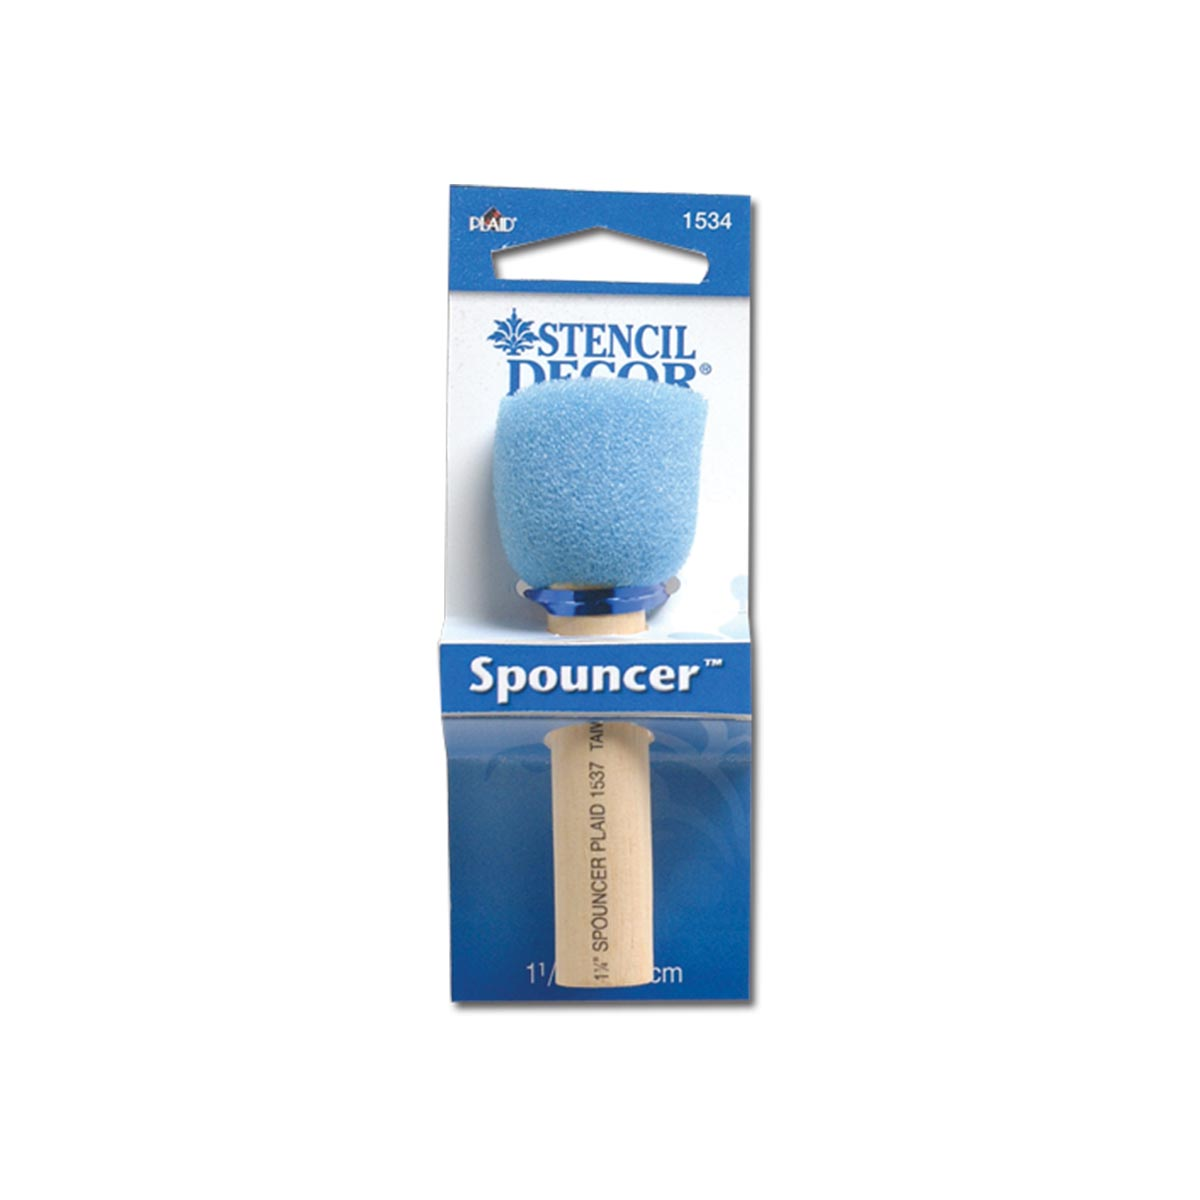 FolkArt ® Painting Tools - Spouncer ® Stenciling Sponge - Medium